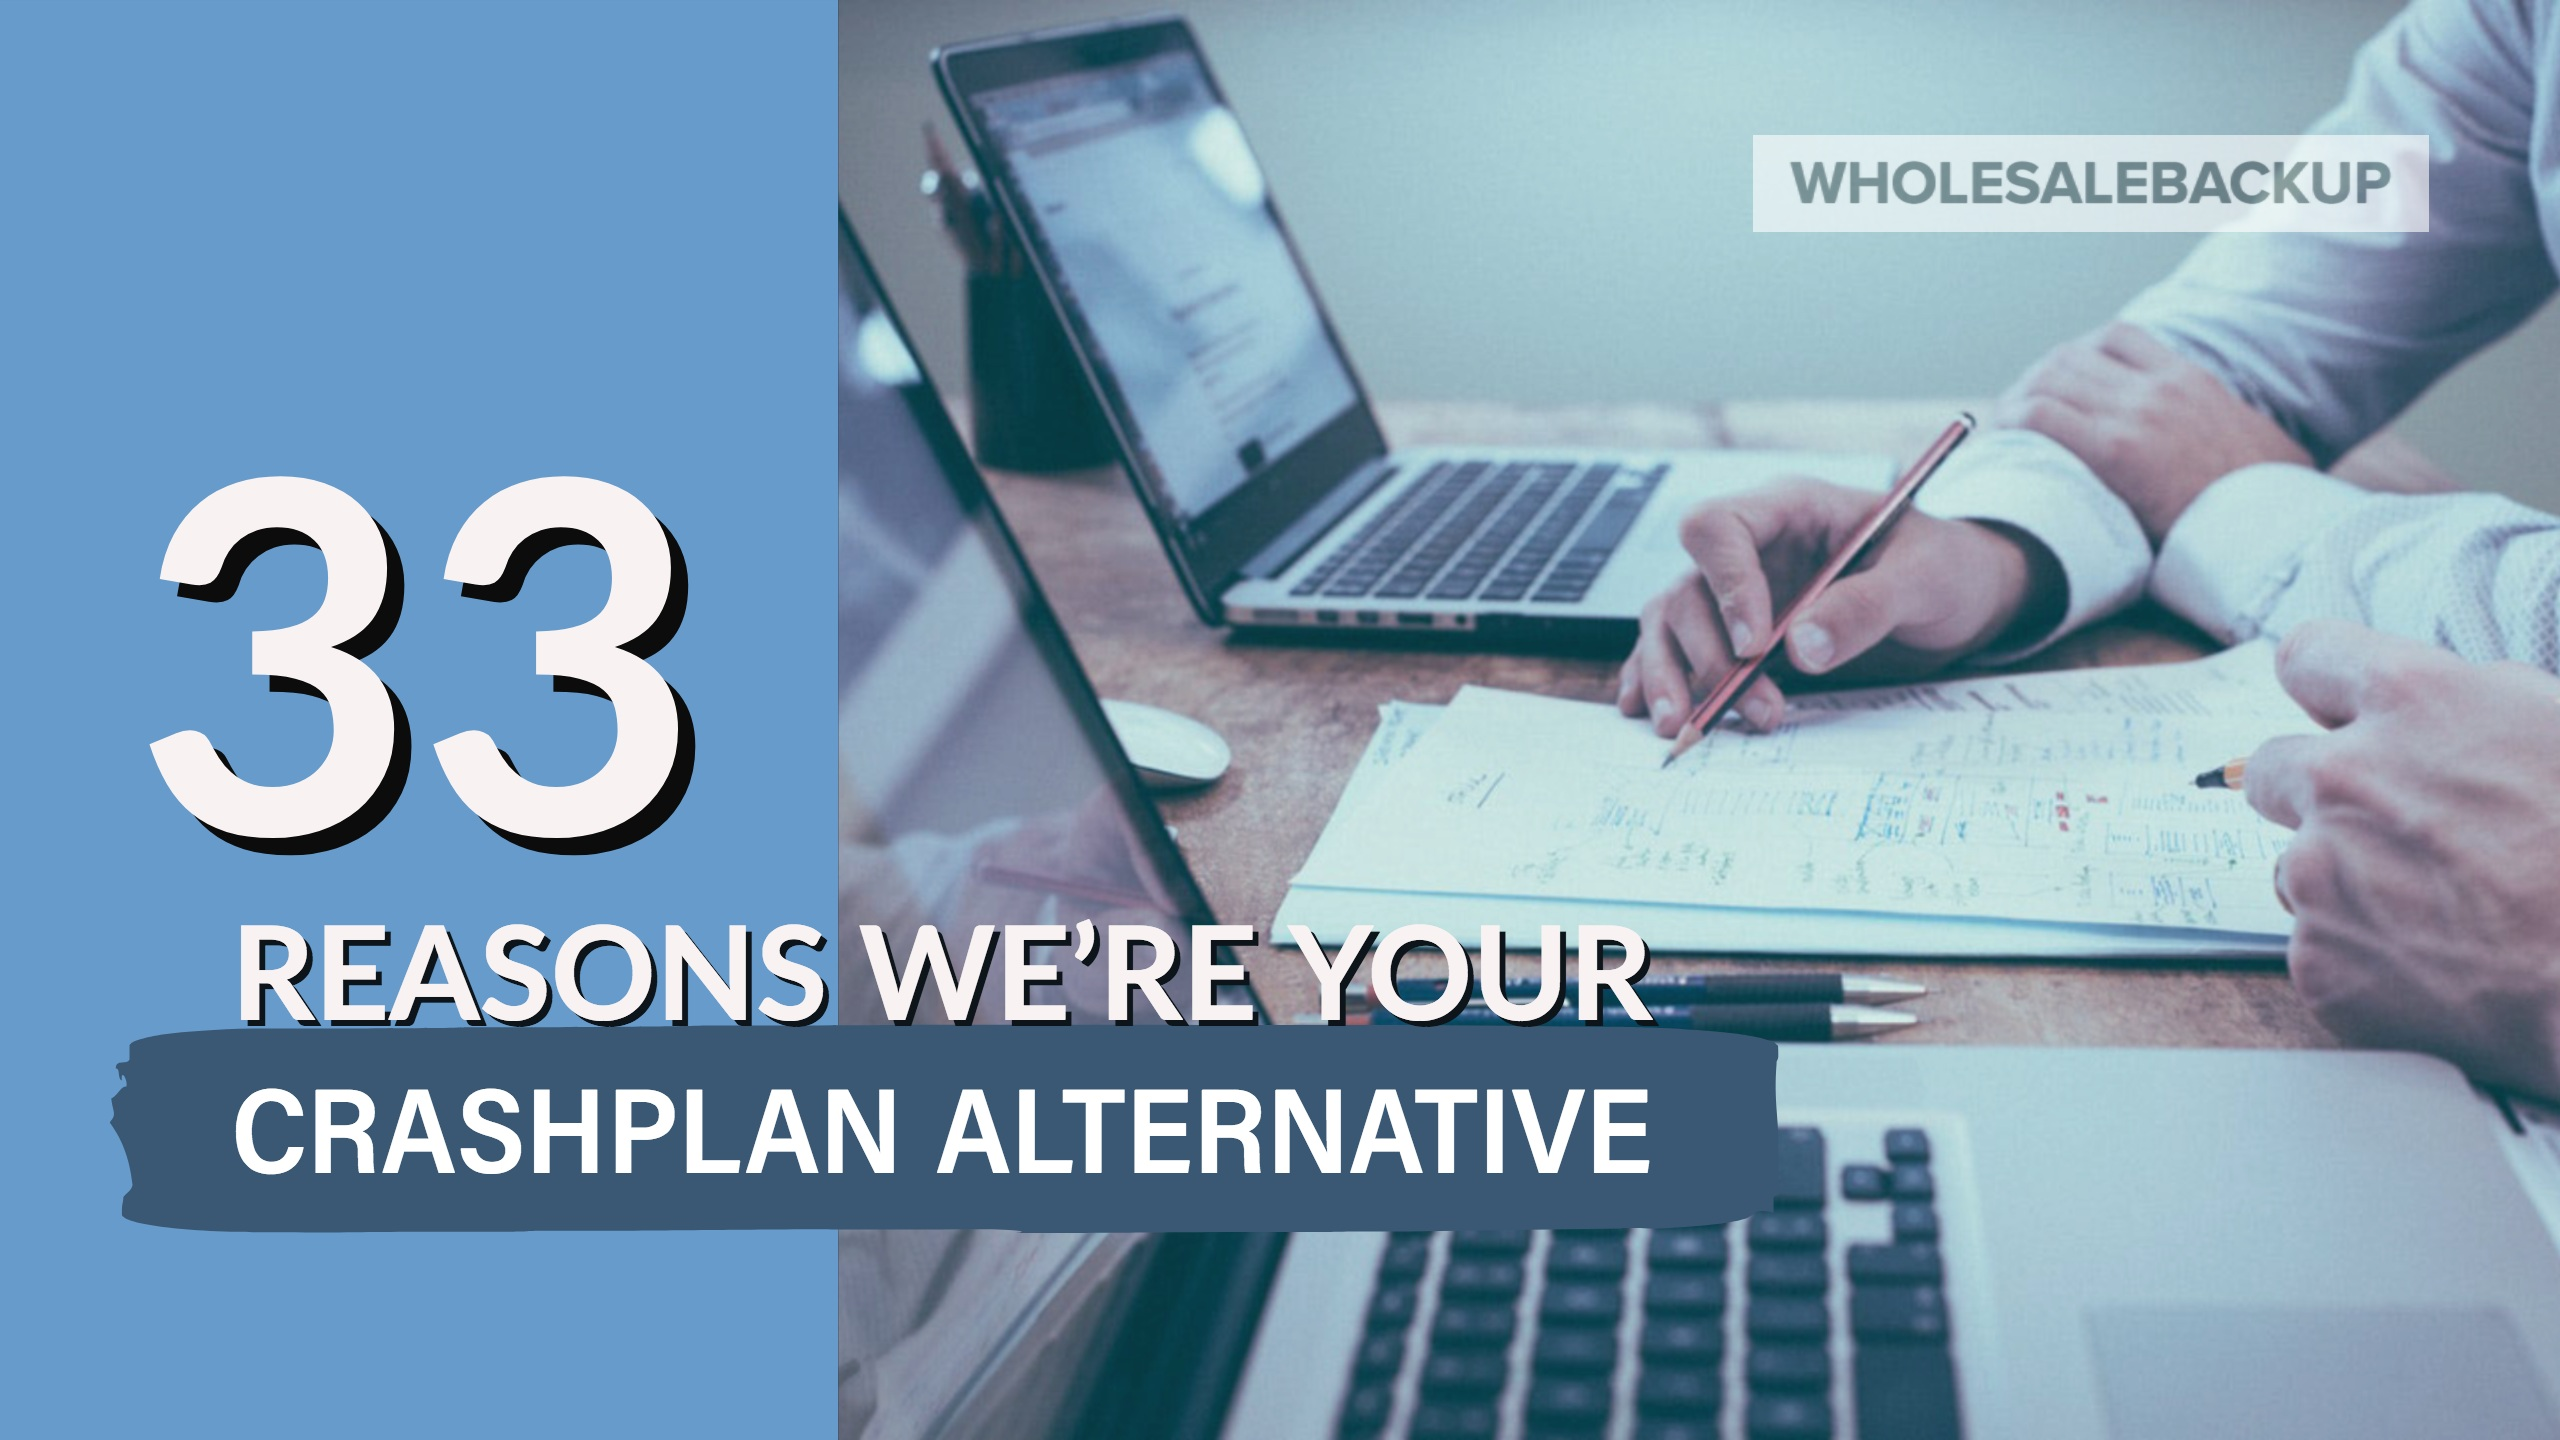 33-reasons-wholesalebackup-is-the-crashplan-alternative